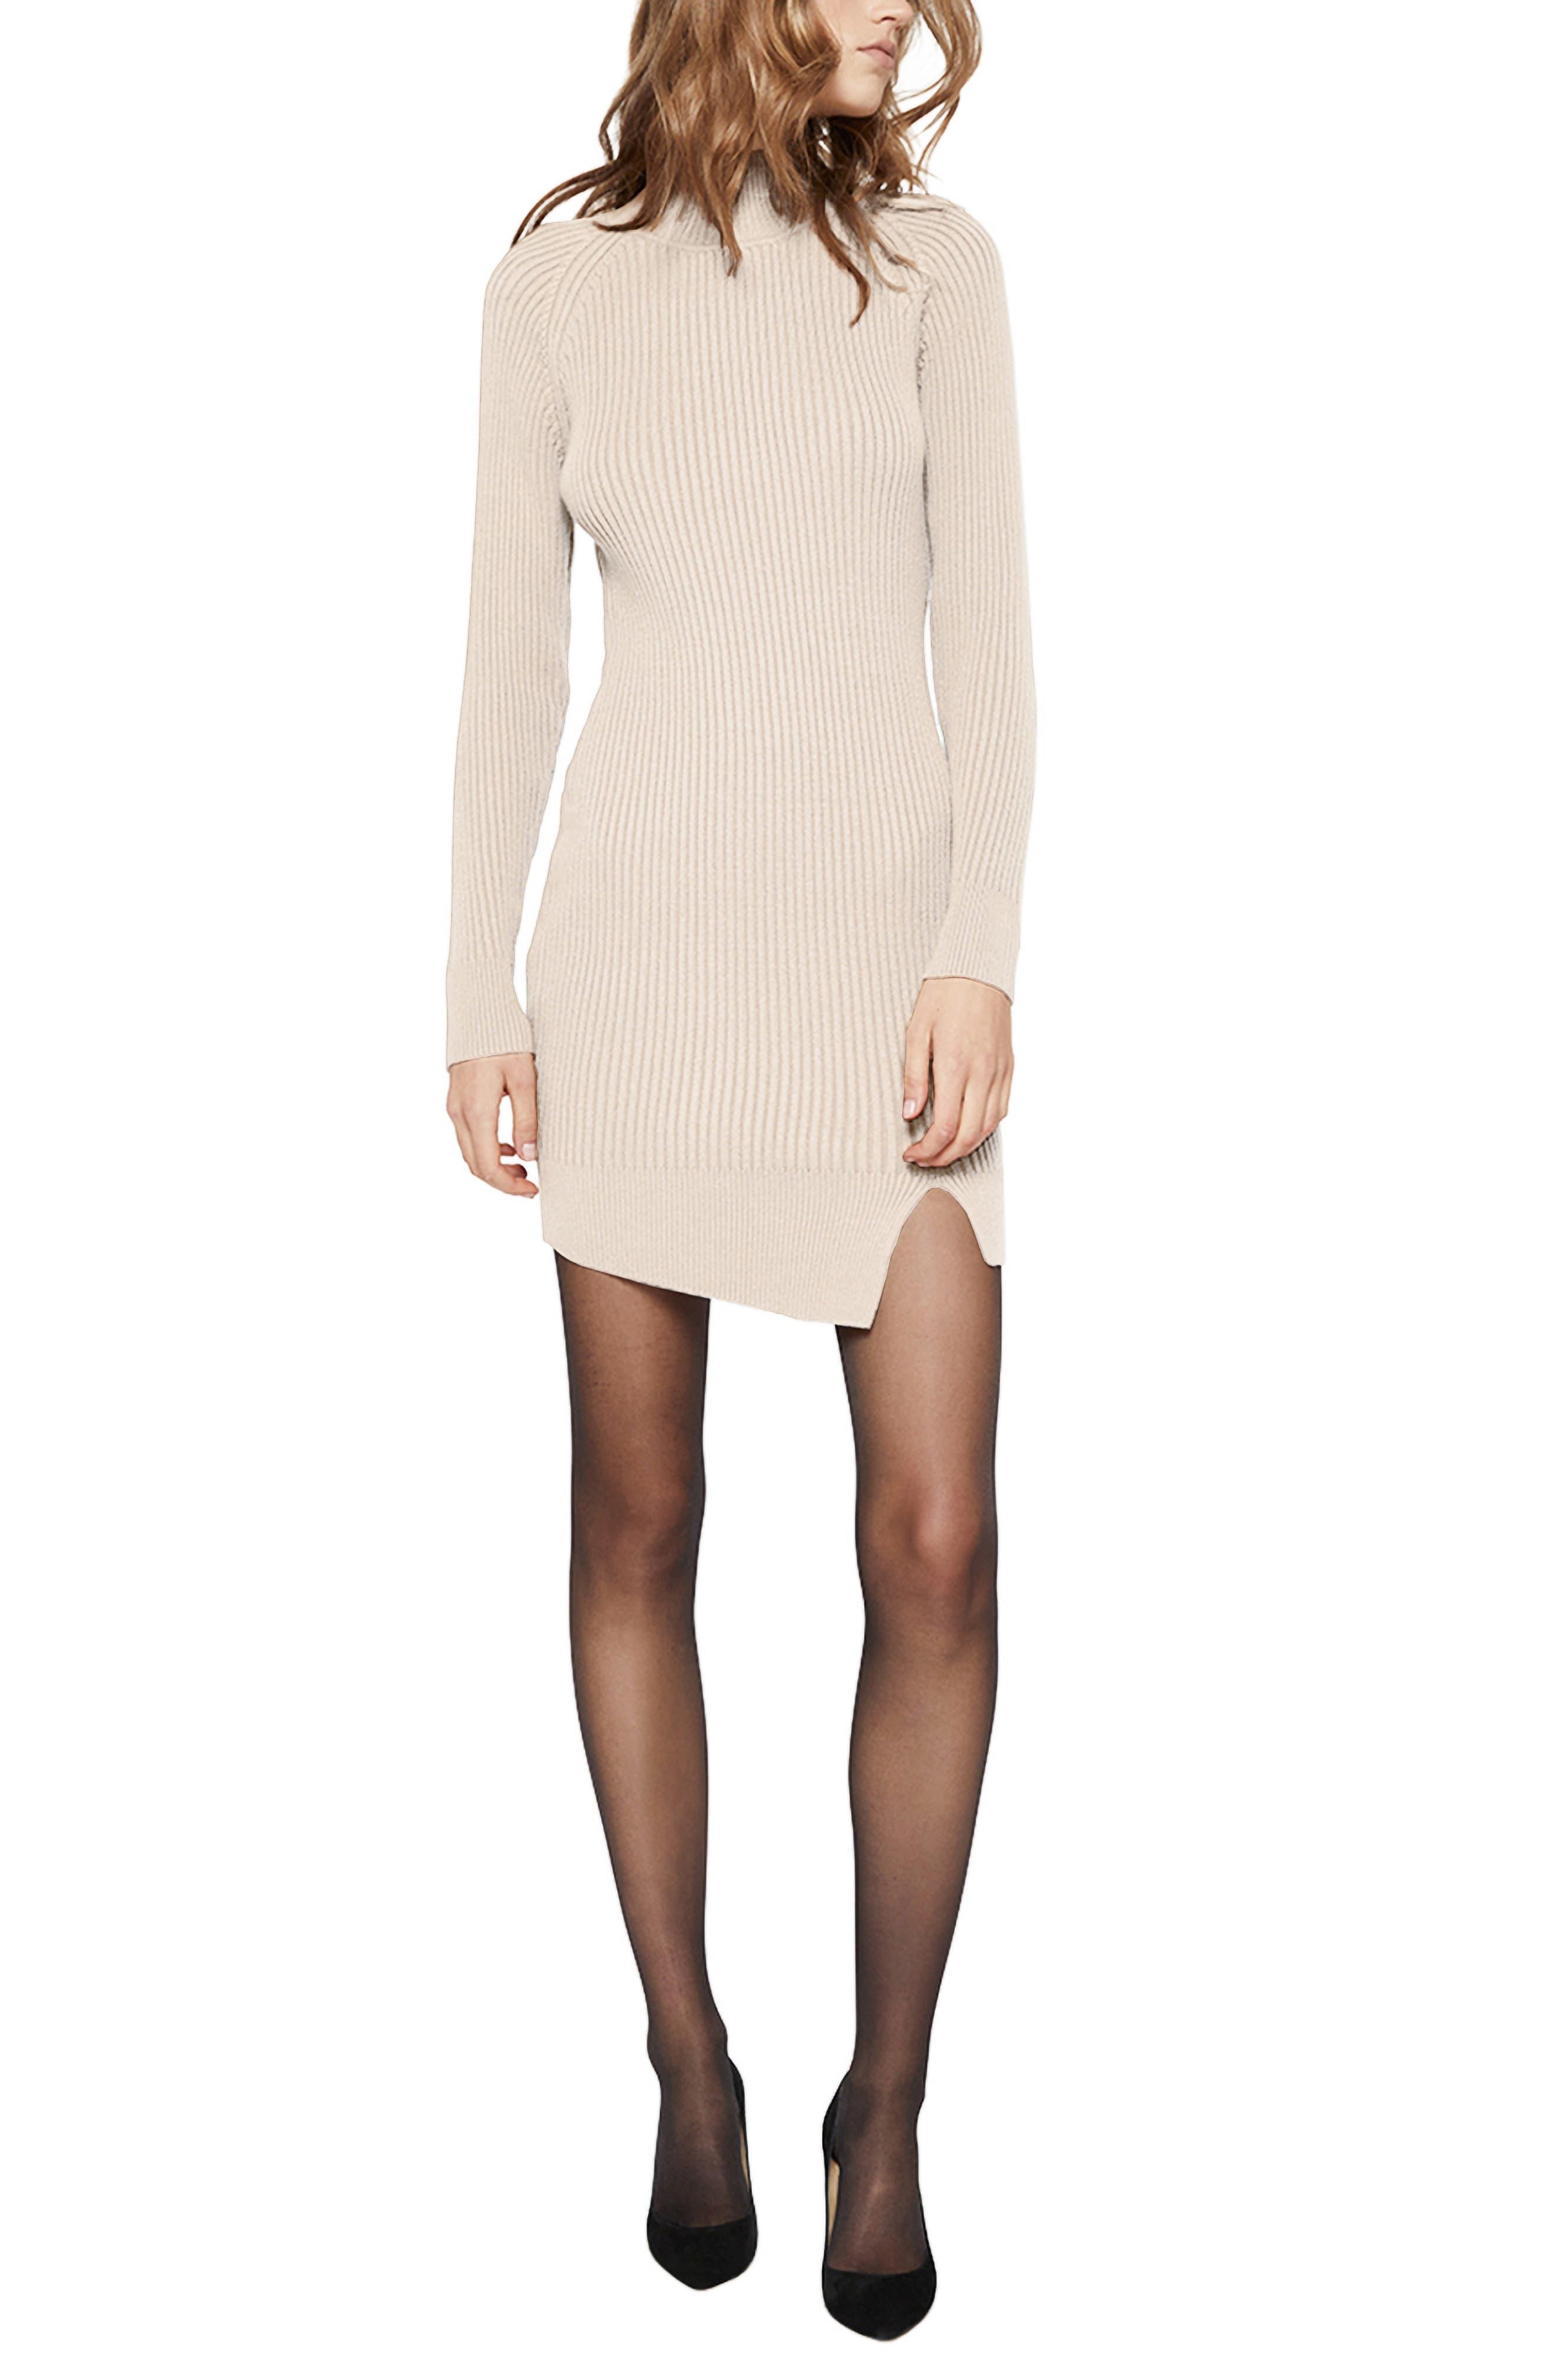 Tahani Long Sleeve Sweater Minidress